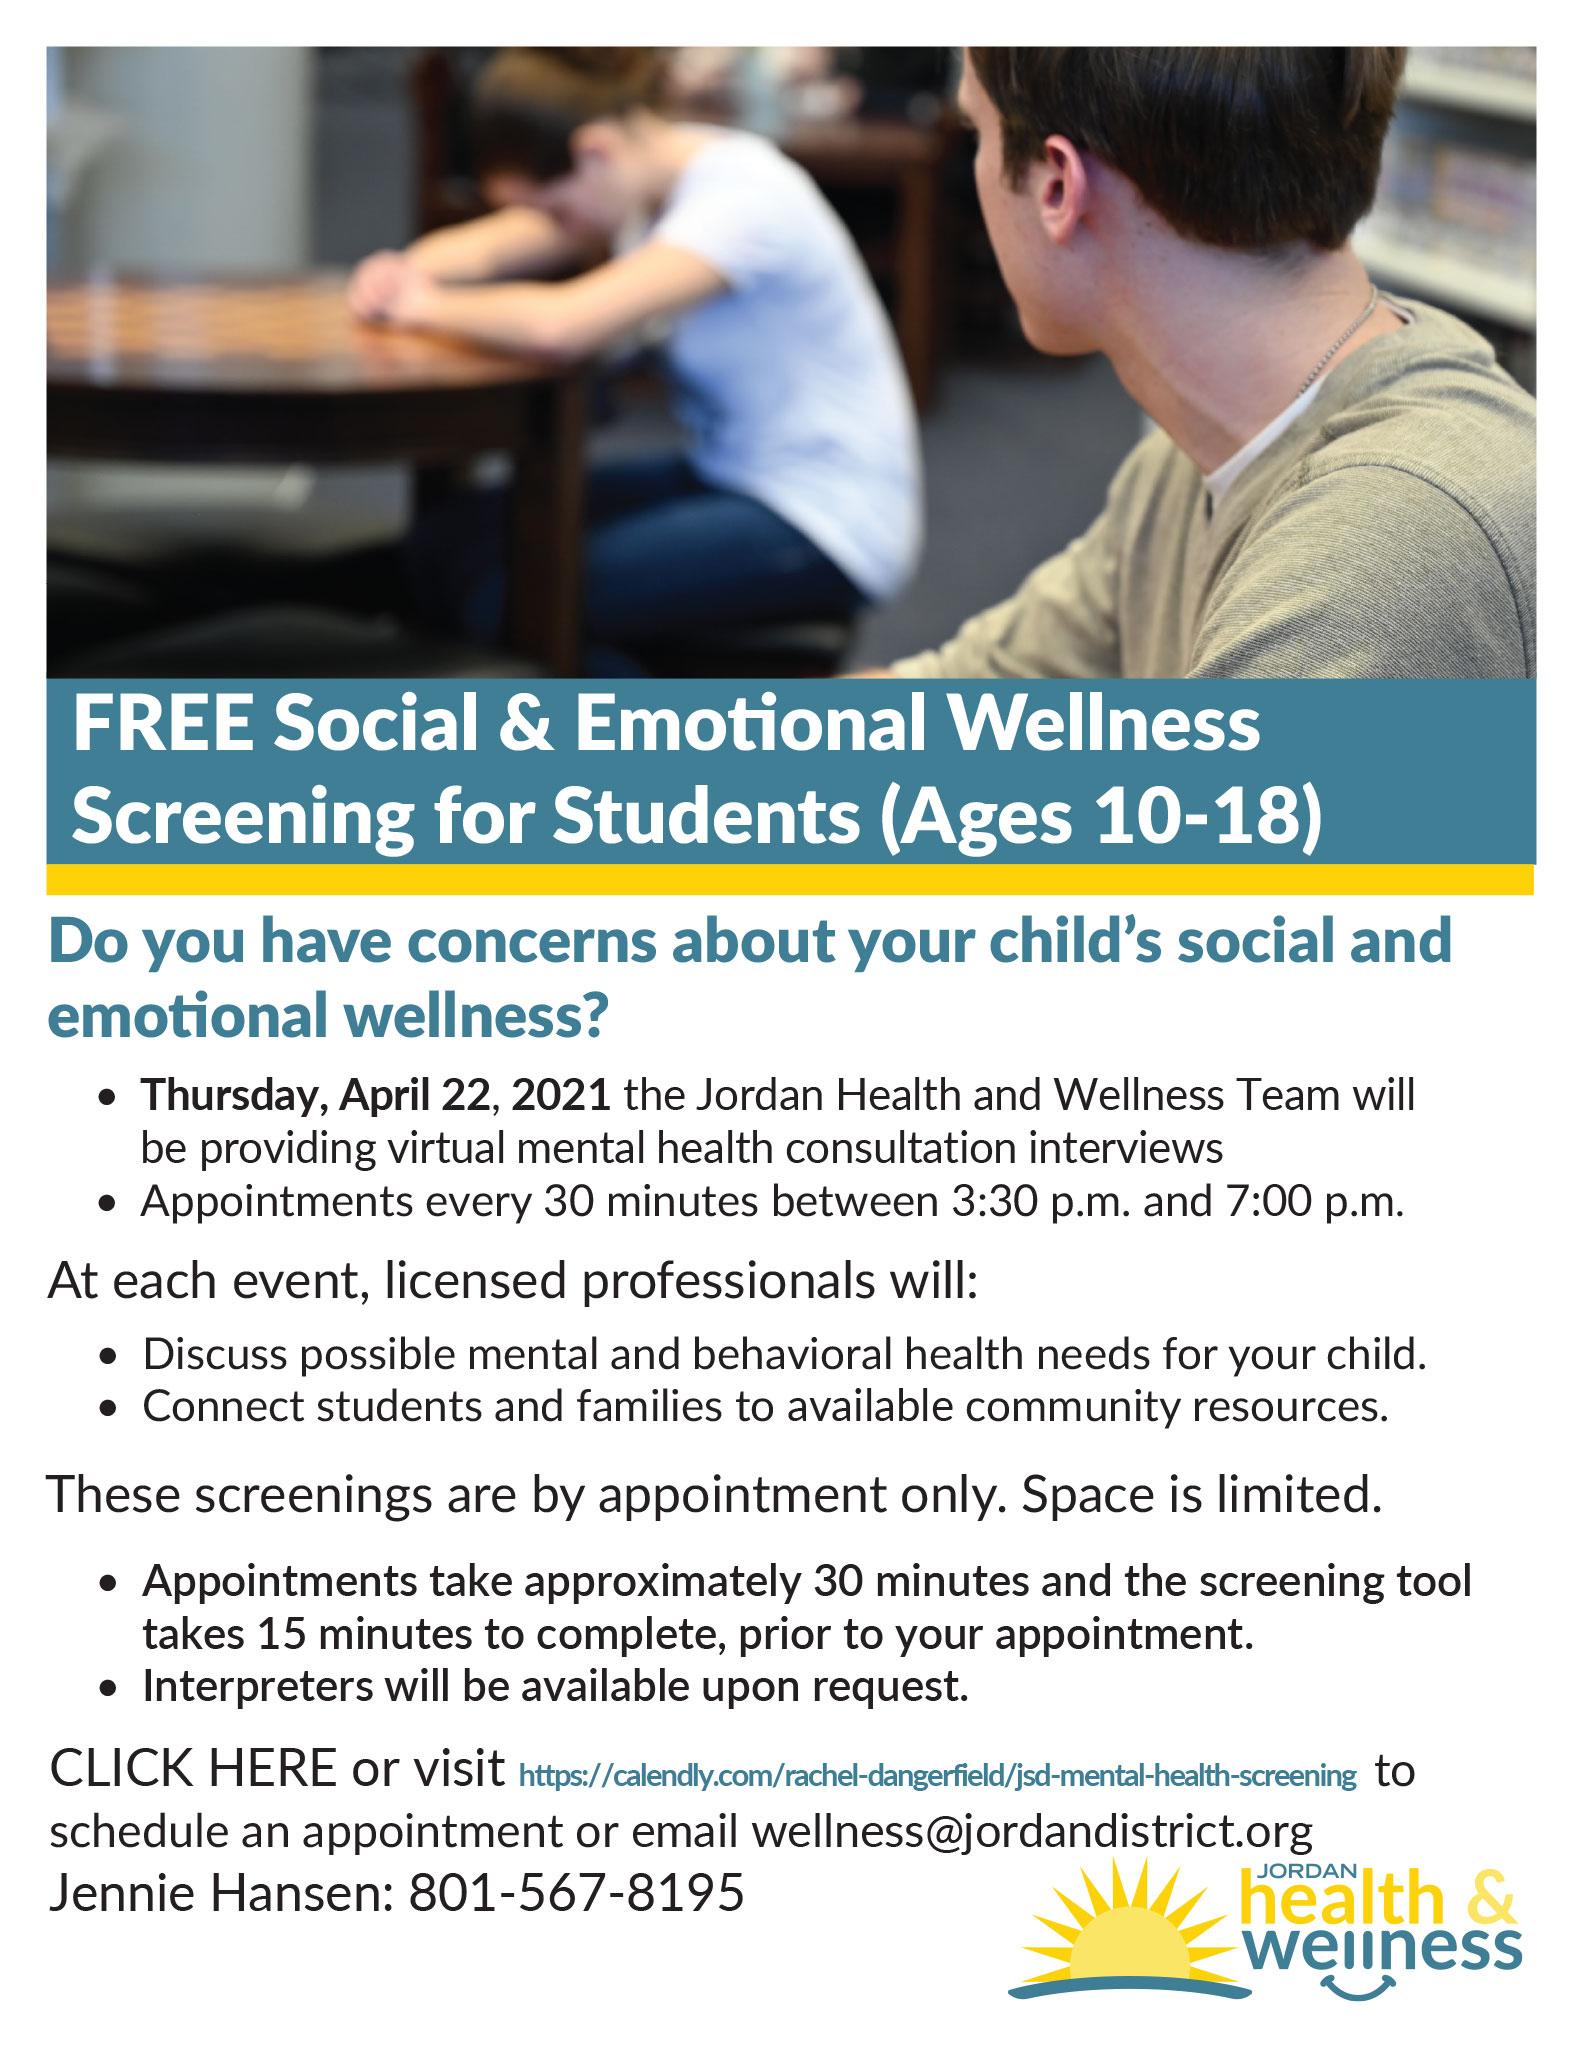 Wellness Screening Flyer